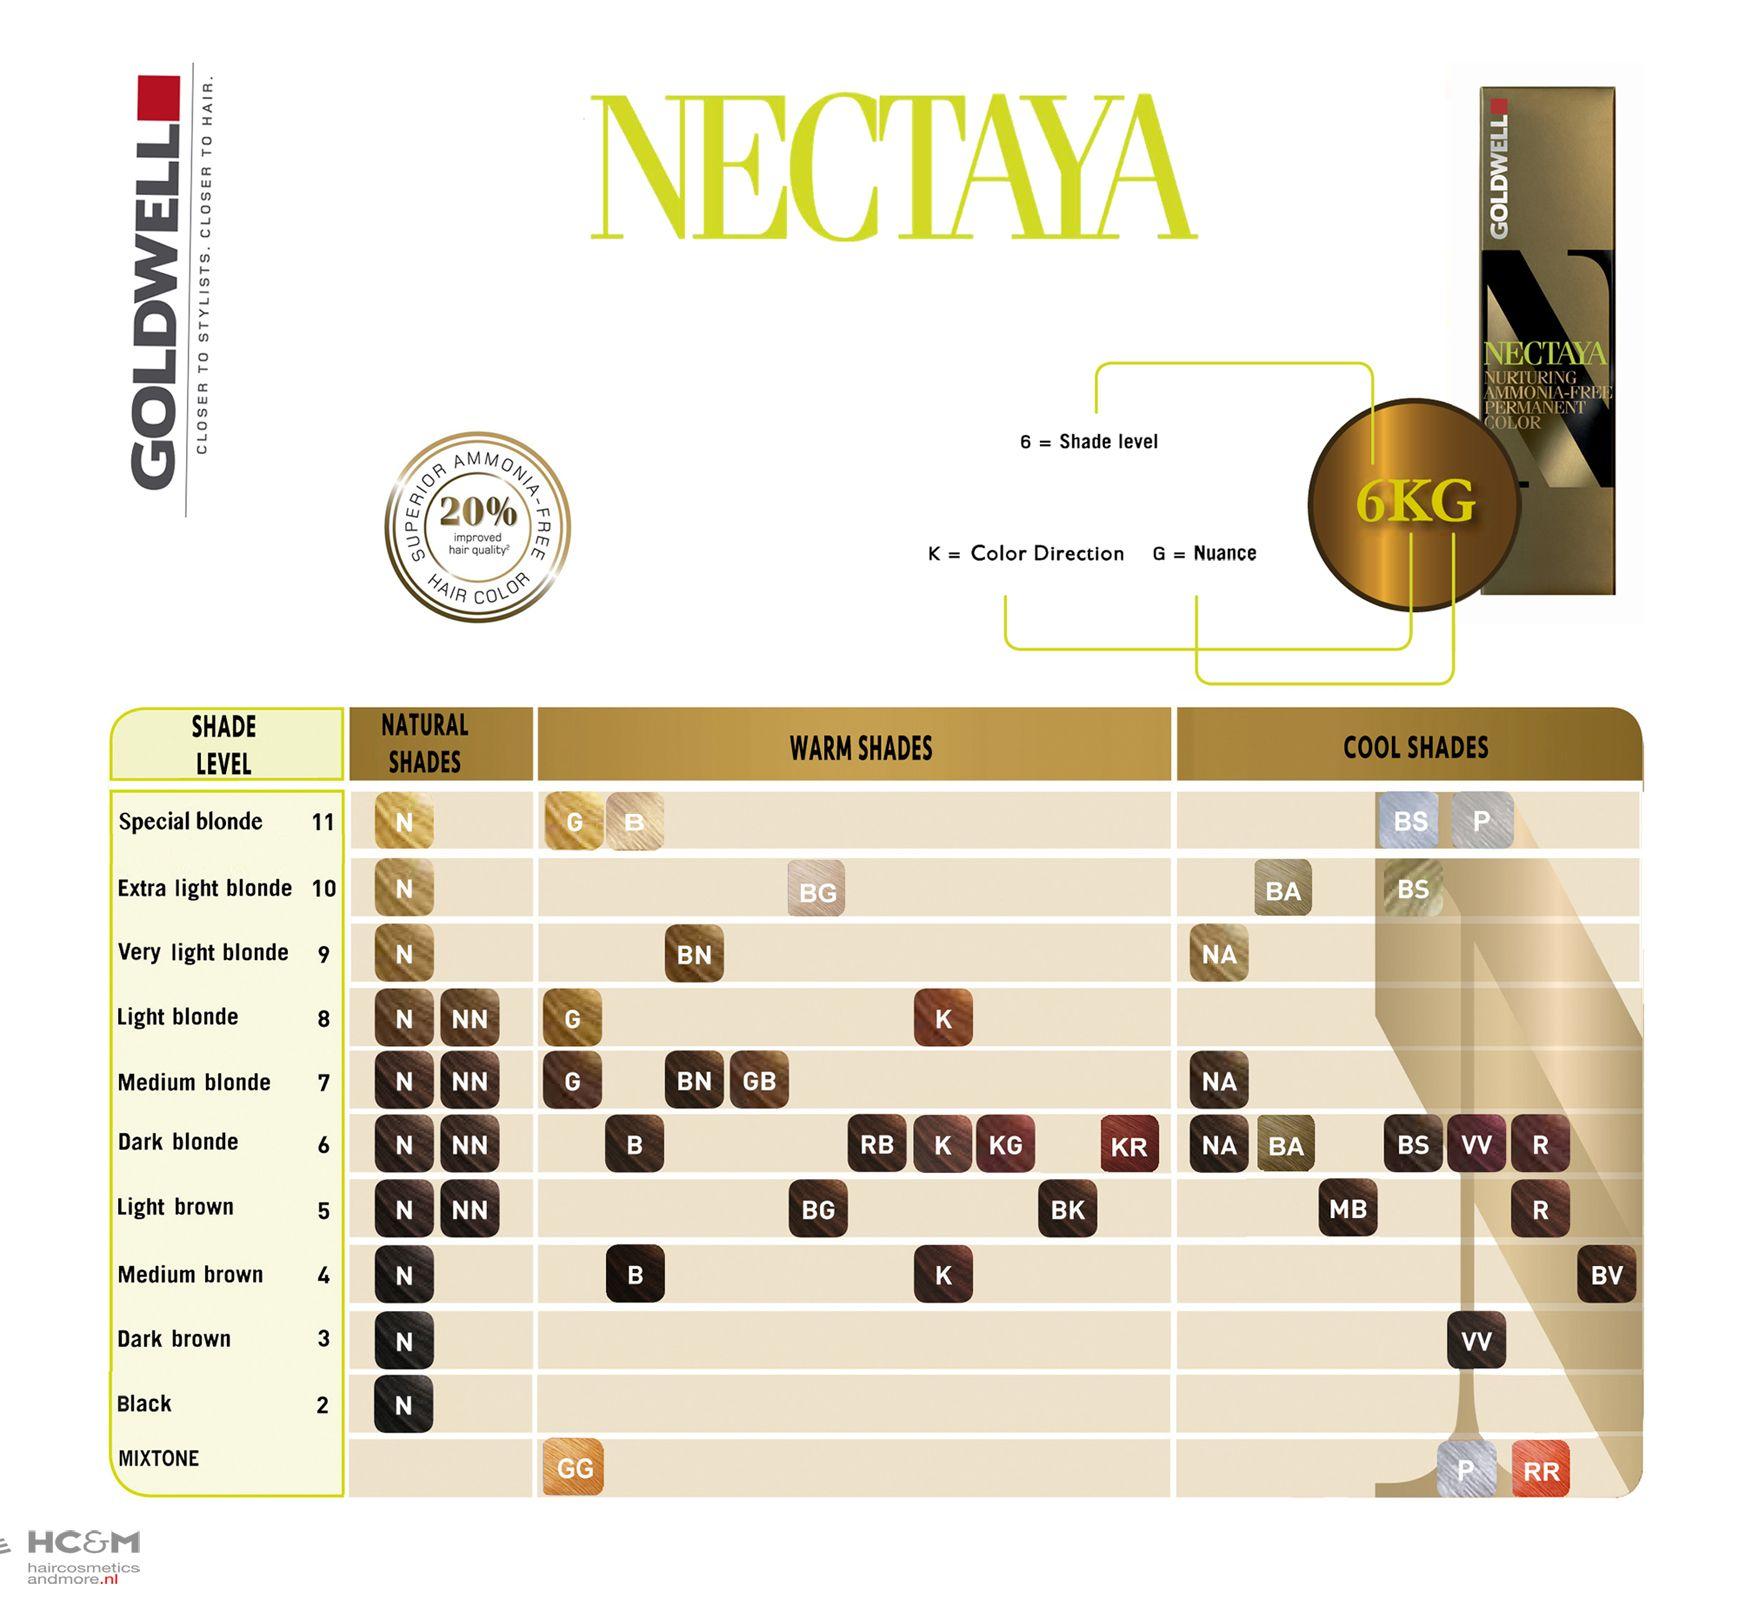 Goldwell Nectaya Nurturing Hair Color Shade Chart